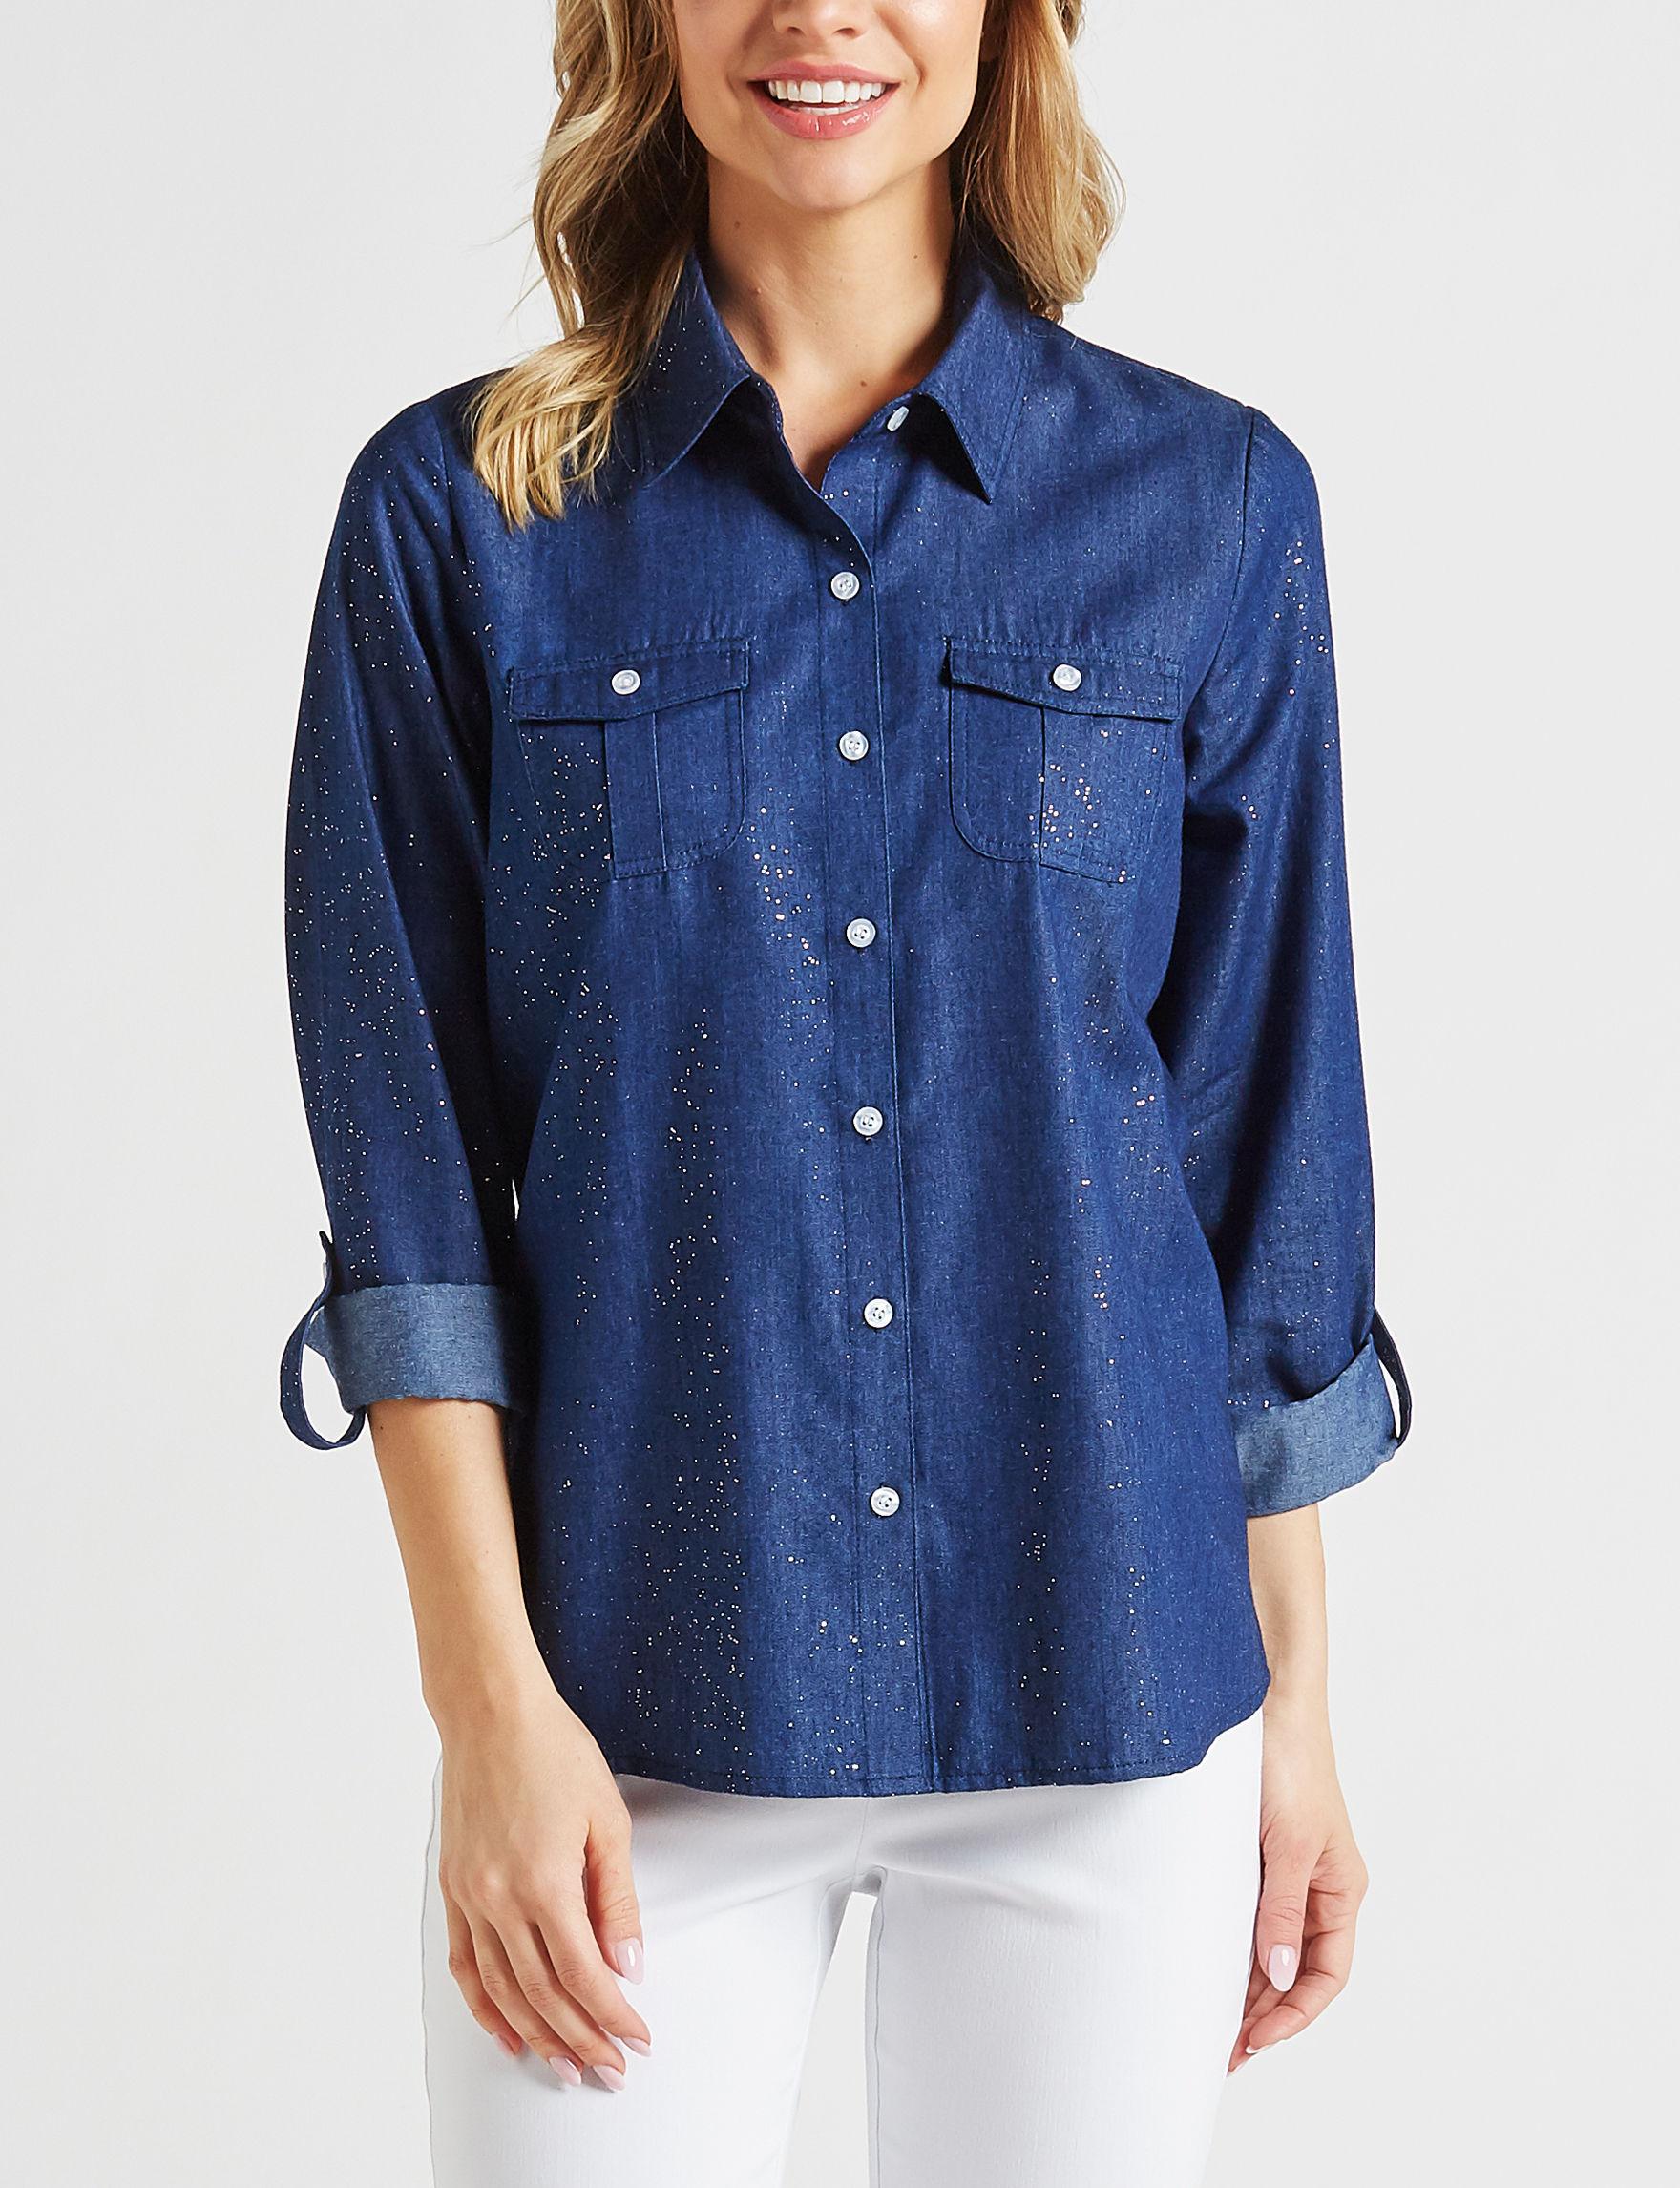 Cathy Daniels Denim Shirts & Blouses